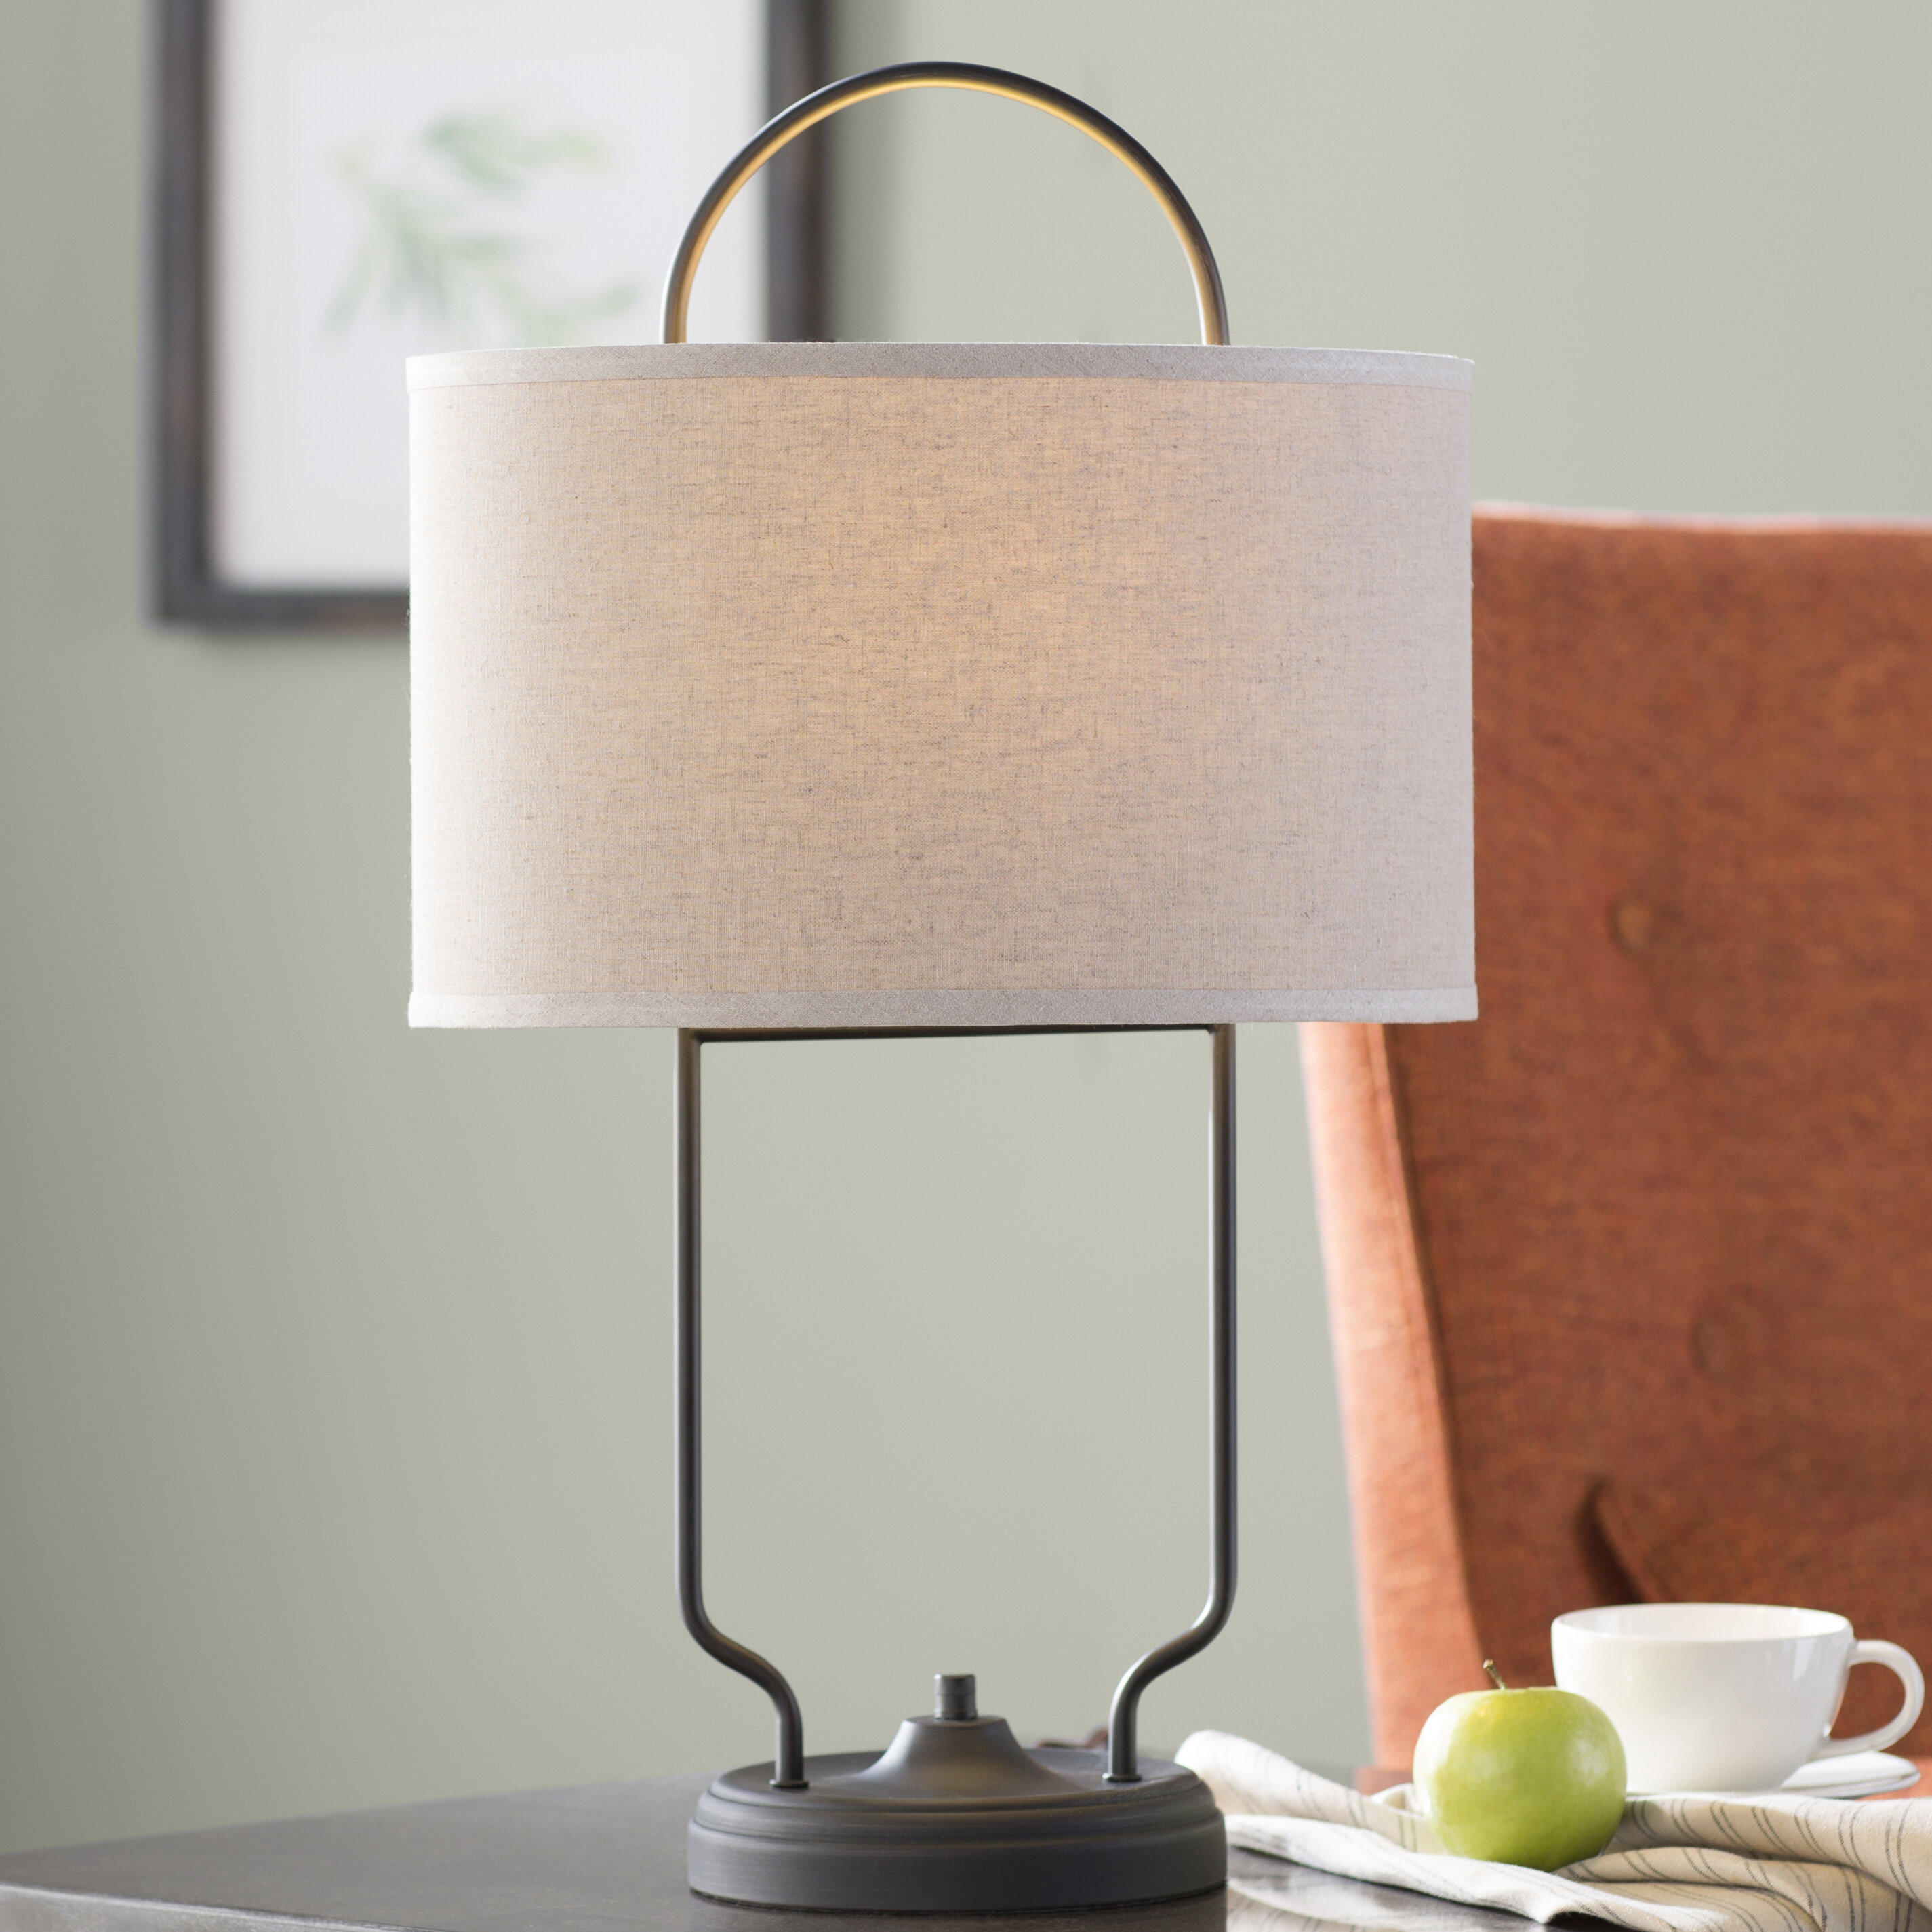 Laurel foundry modern farmhouse cecil 25 5 table lamp reviews wayfair